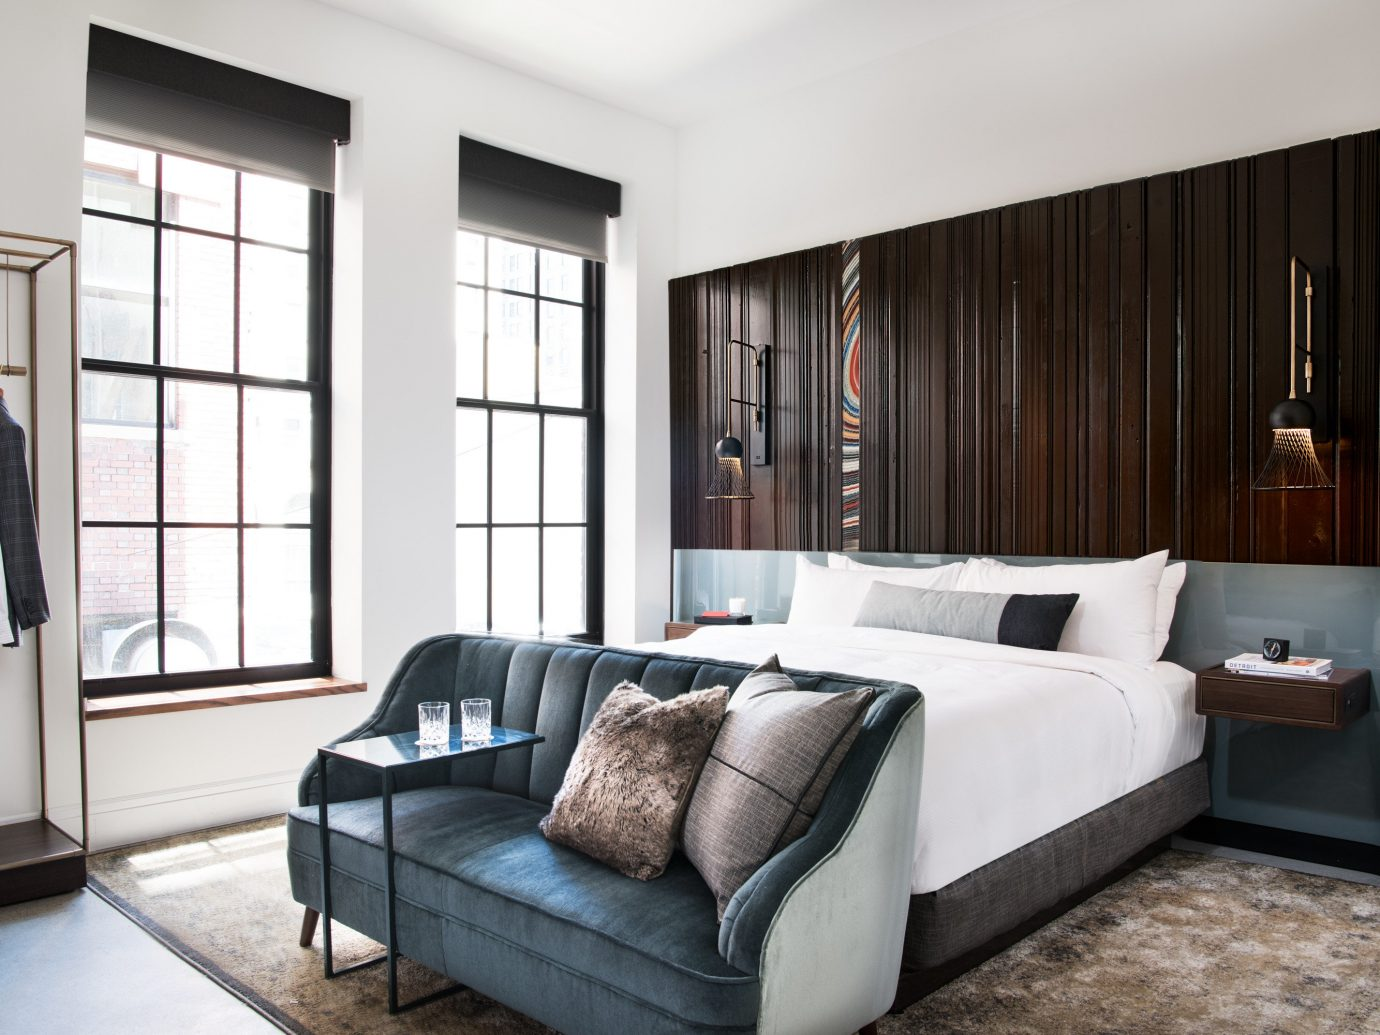 Bedroom at Detroit Foundation Hotel